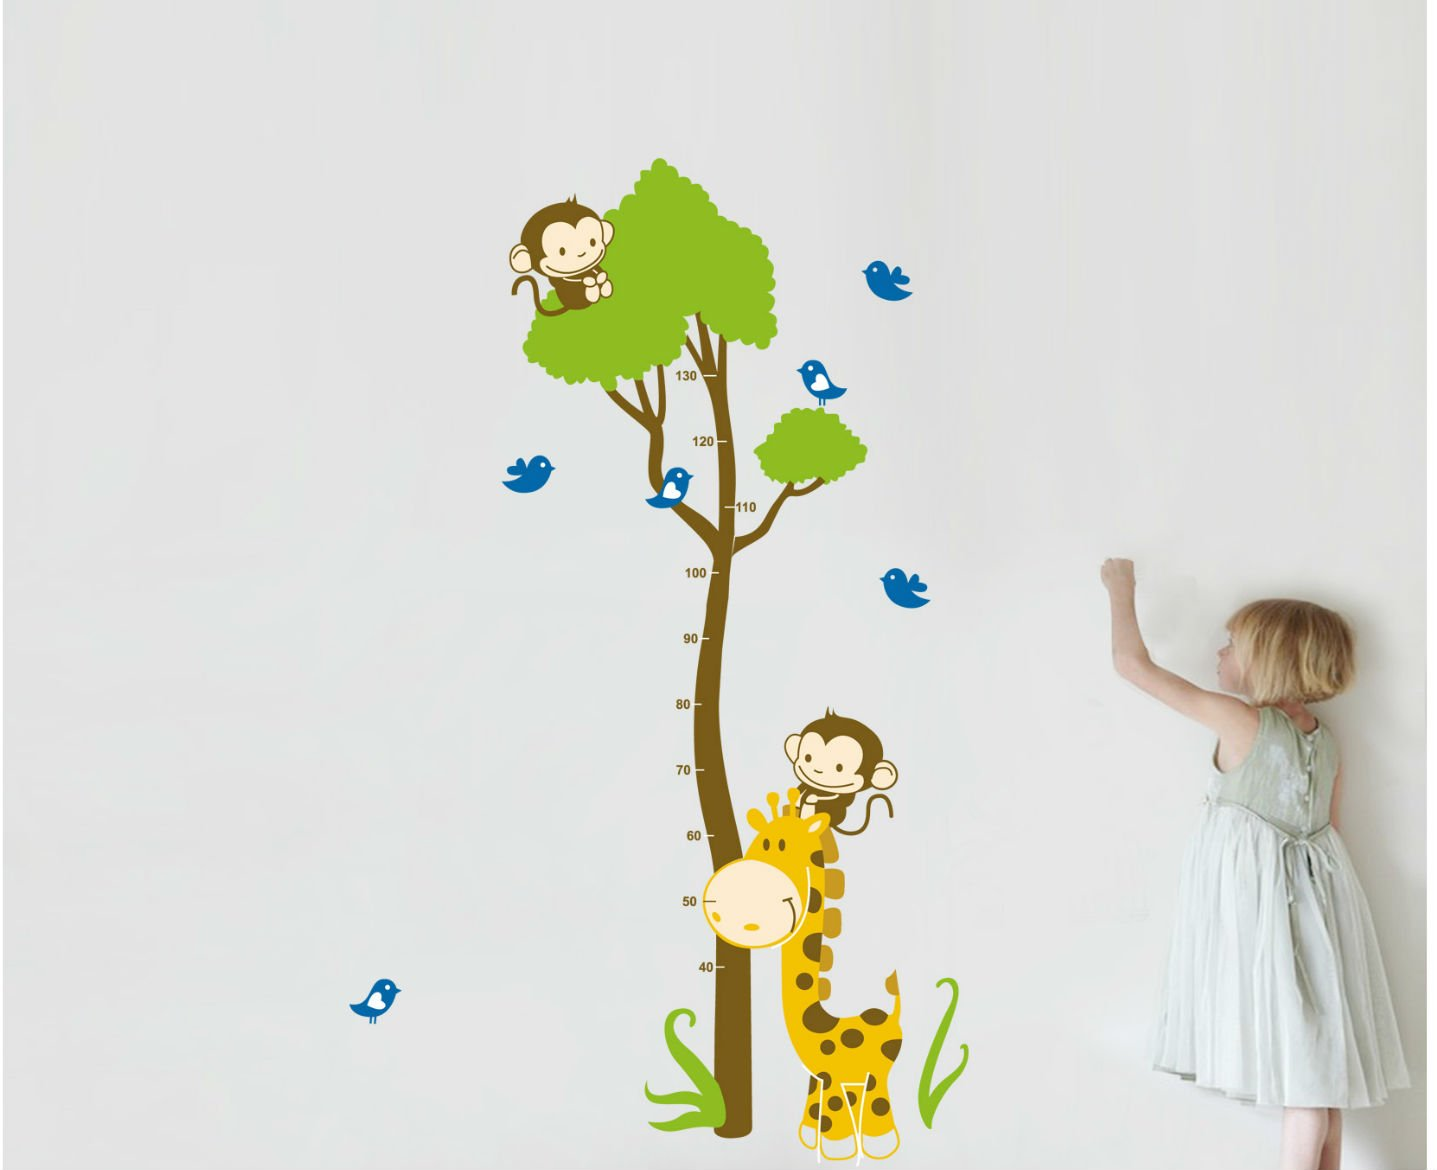 Kinderzimmer Babyzimmer Entfernbare Wandtattoos Wandbilder ufengke/® Comic-Tiere Cute Waschb/är Affen Elefanten Leoparden und Baum Reben Messlatten Wandsticker